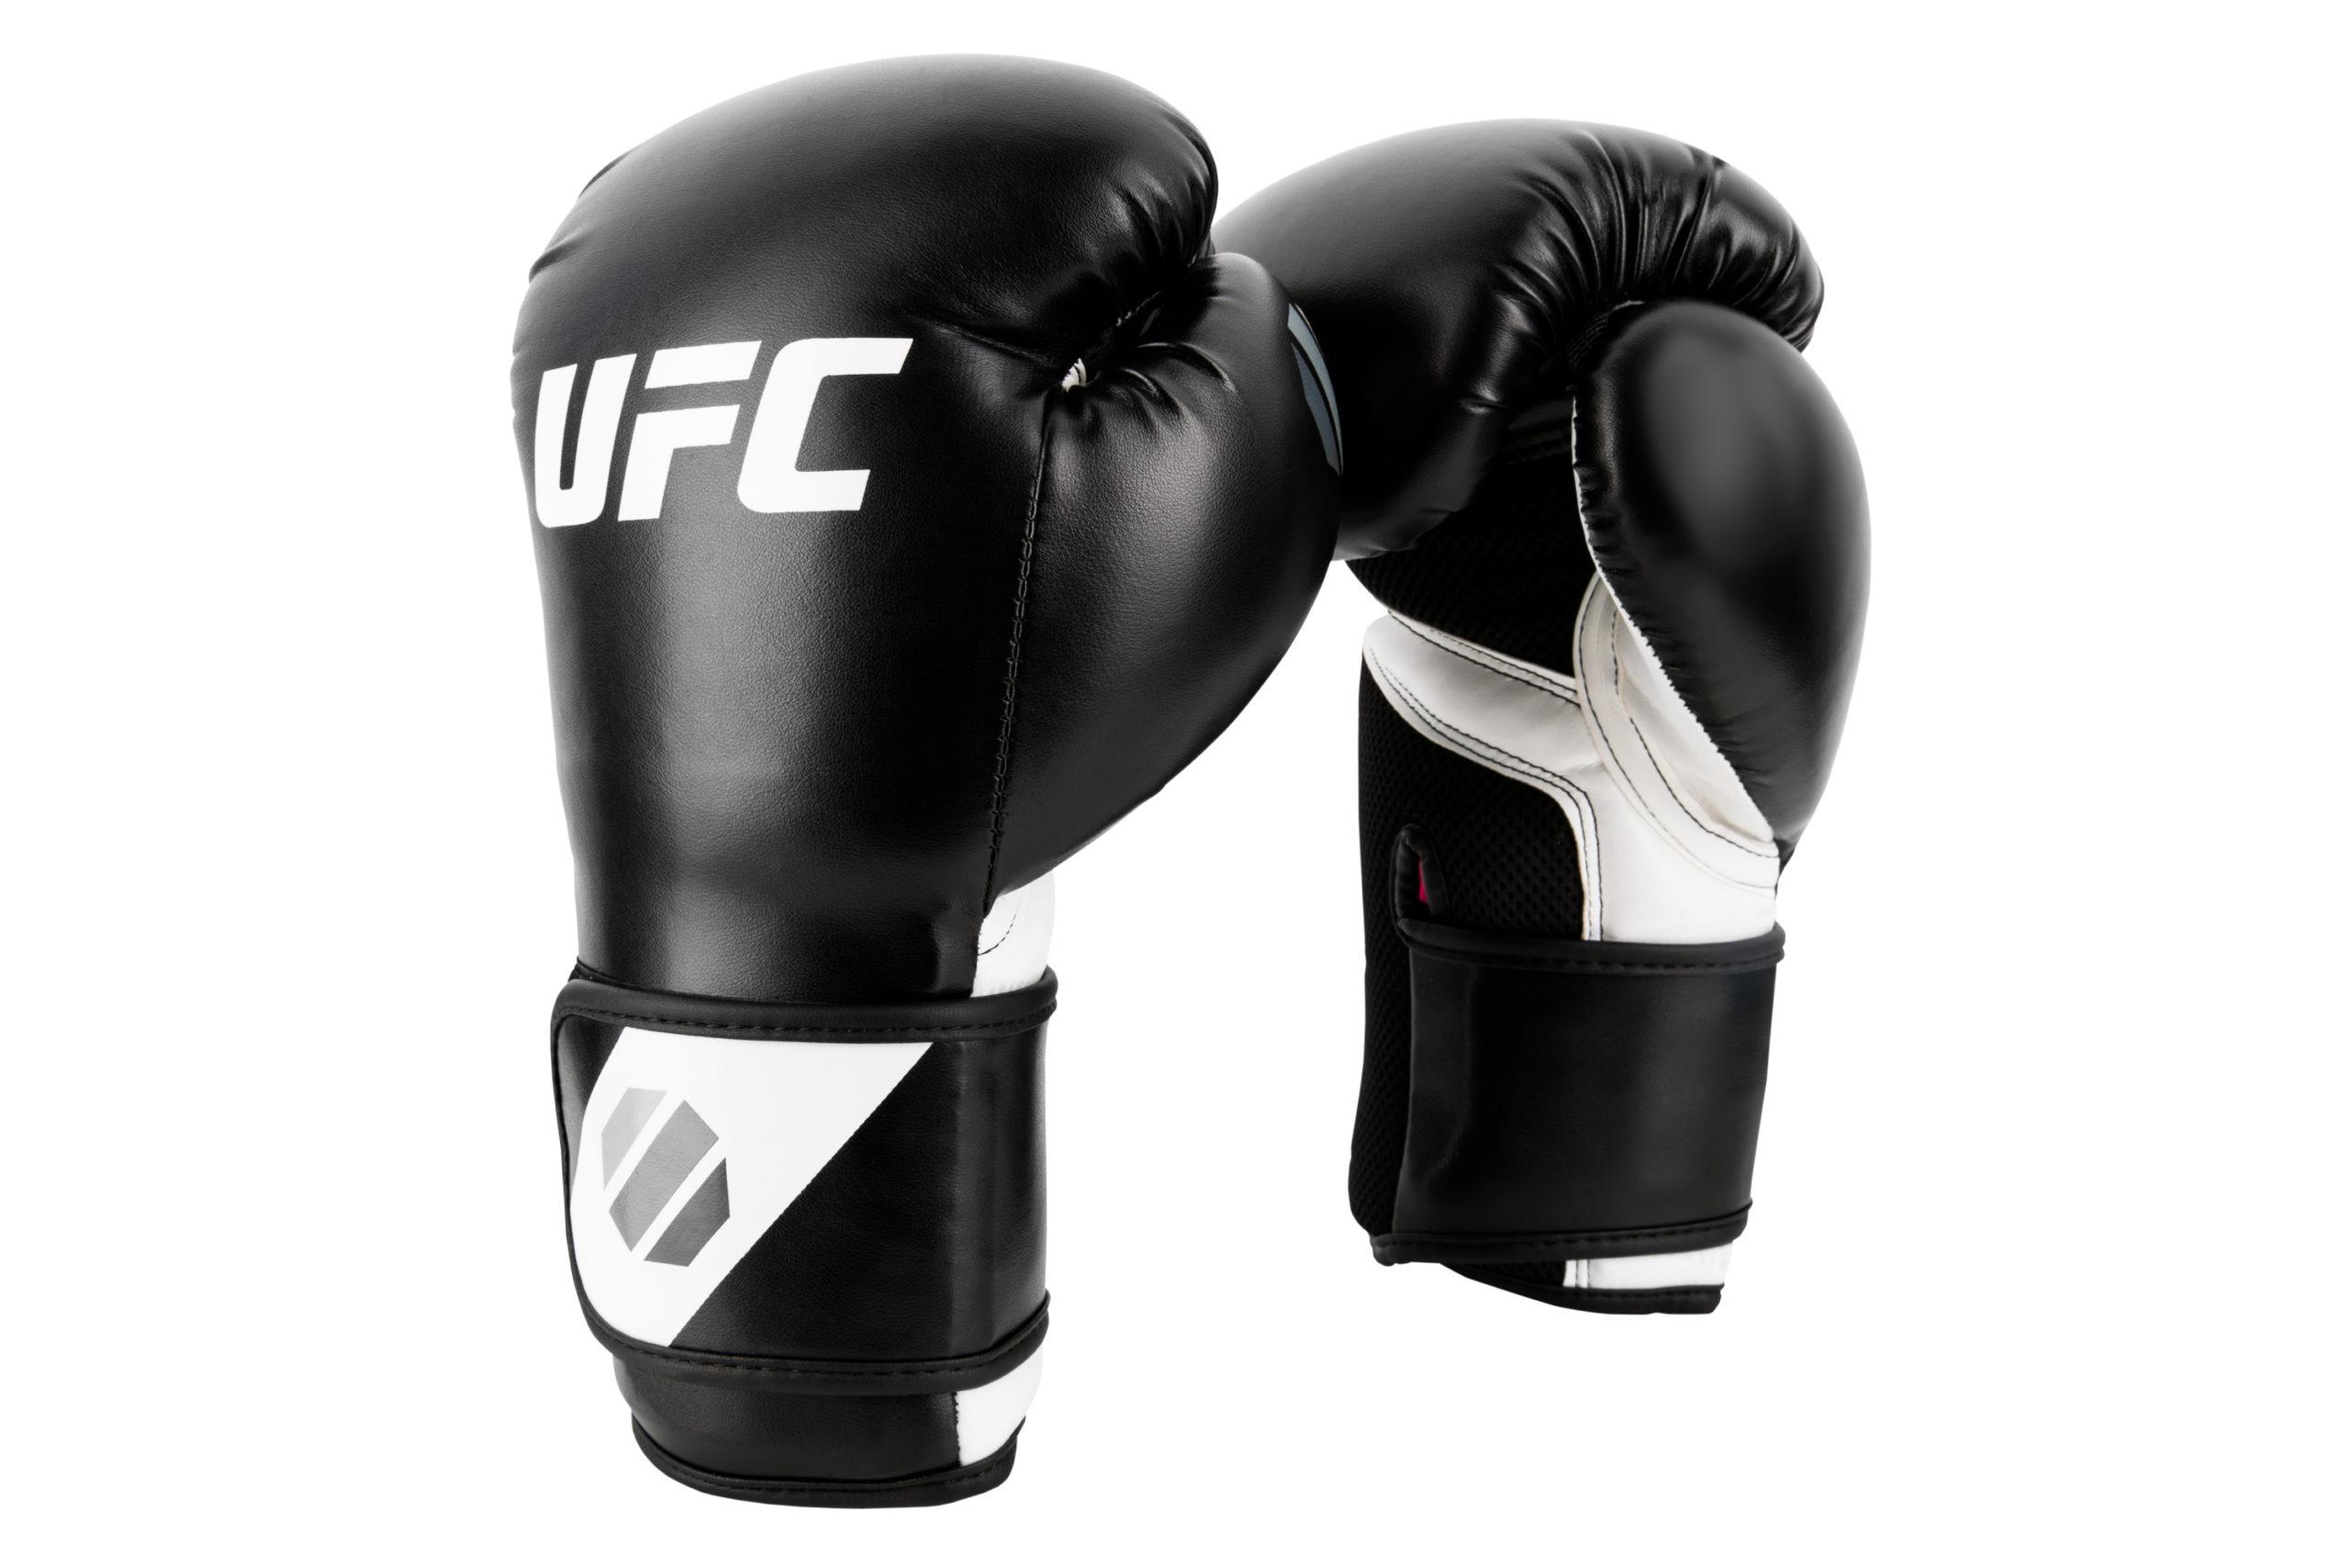 UFC Training (kick)bokshandschoenen Zwart/Wit - 8 oz